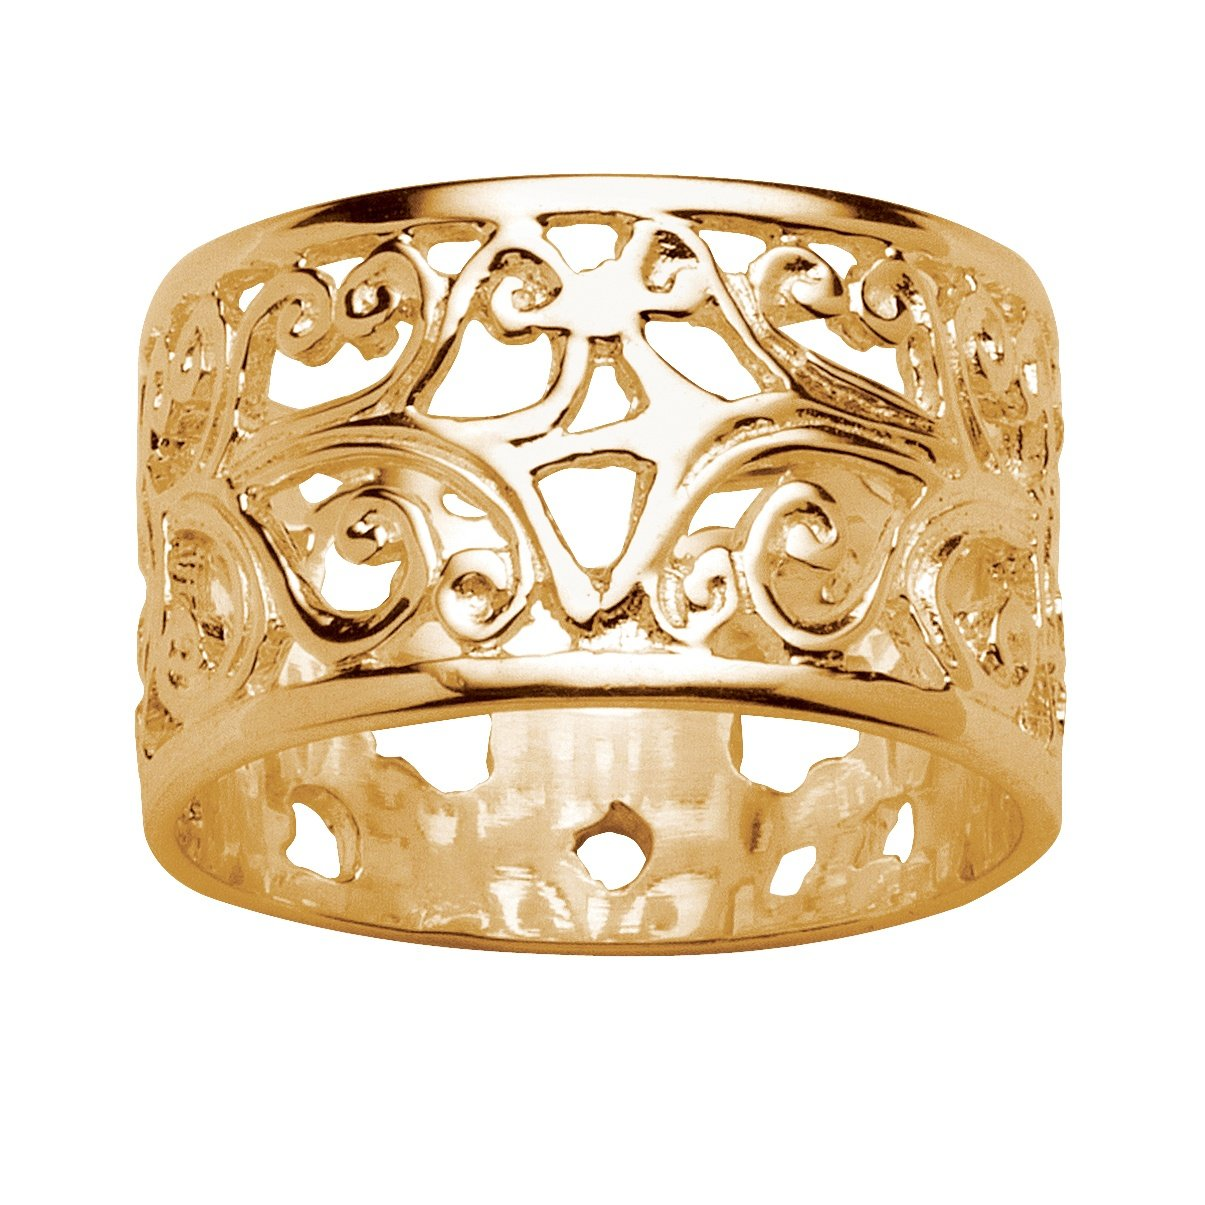 Vintage-Style Filigree 18k Gold over .925 Sterling Silver Ornate Ring Band Size 8